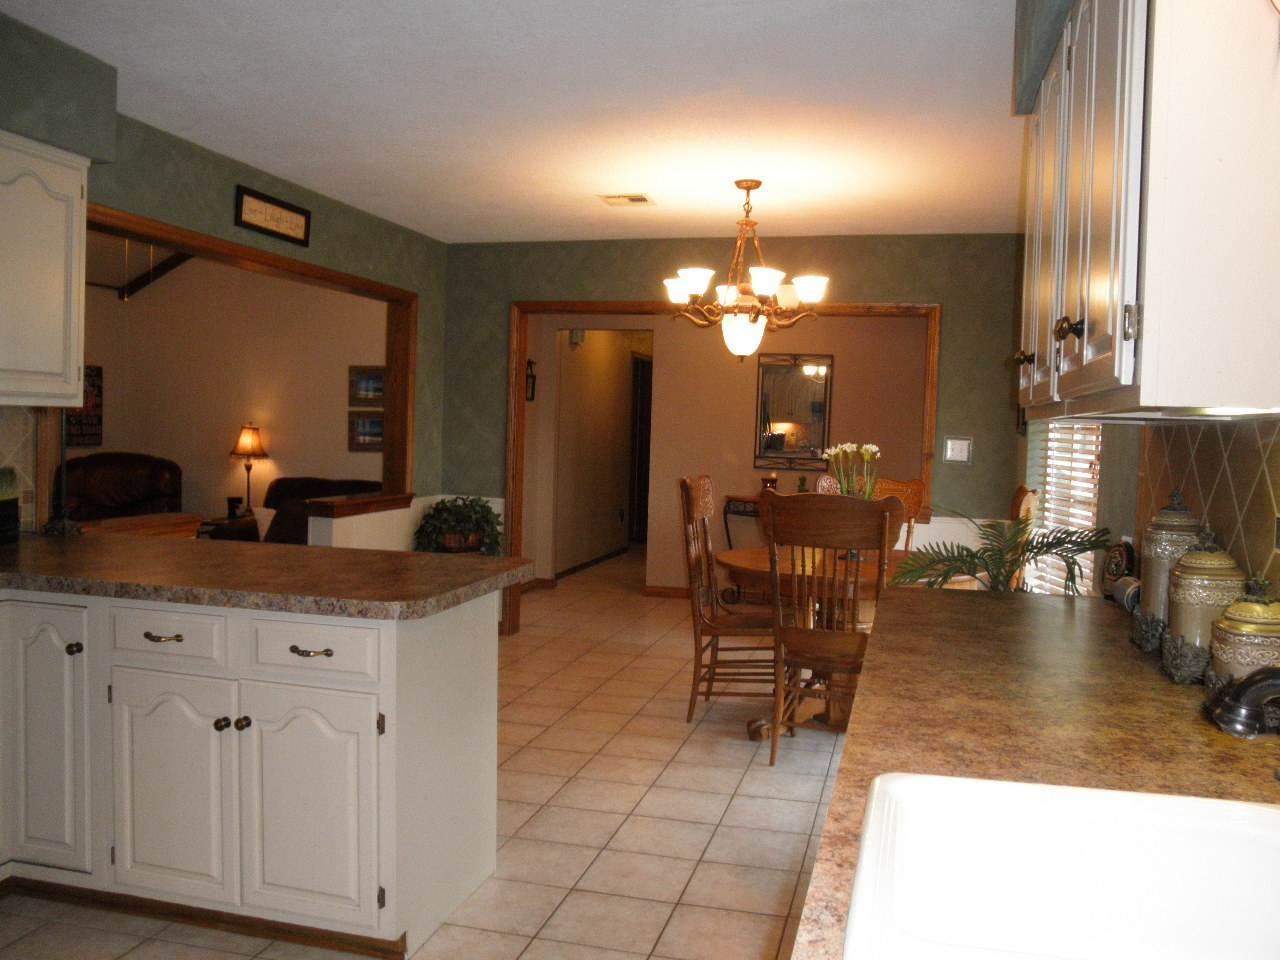 Sold Cross Sale W/ MLS | 2805 Ames  Ponca City, OK  14